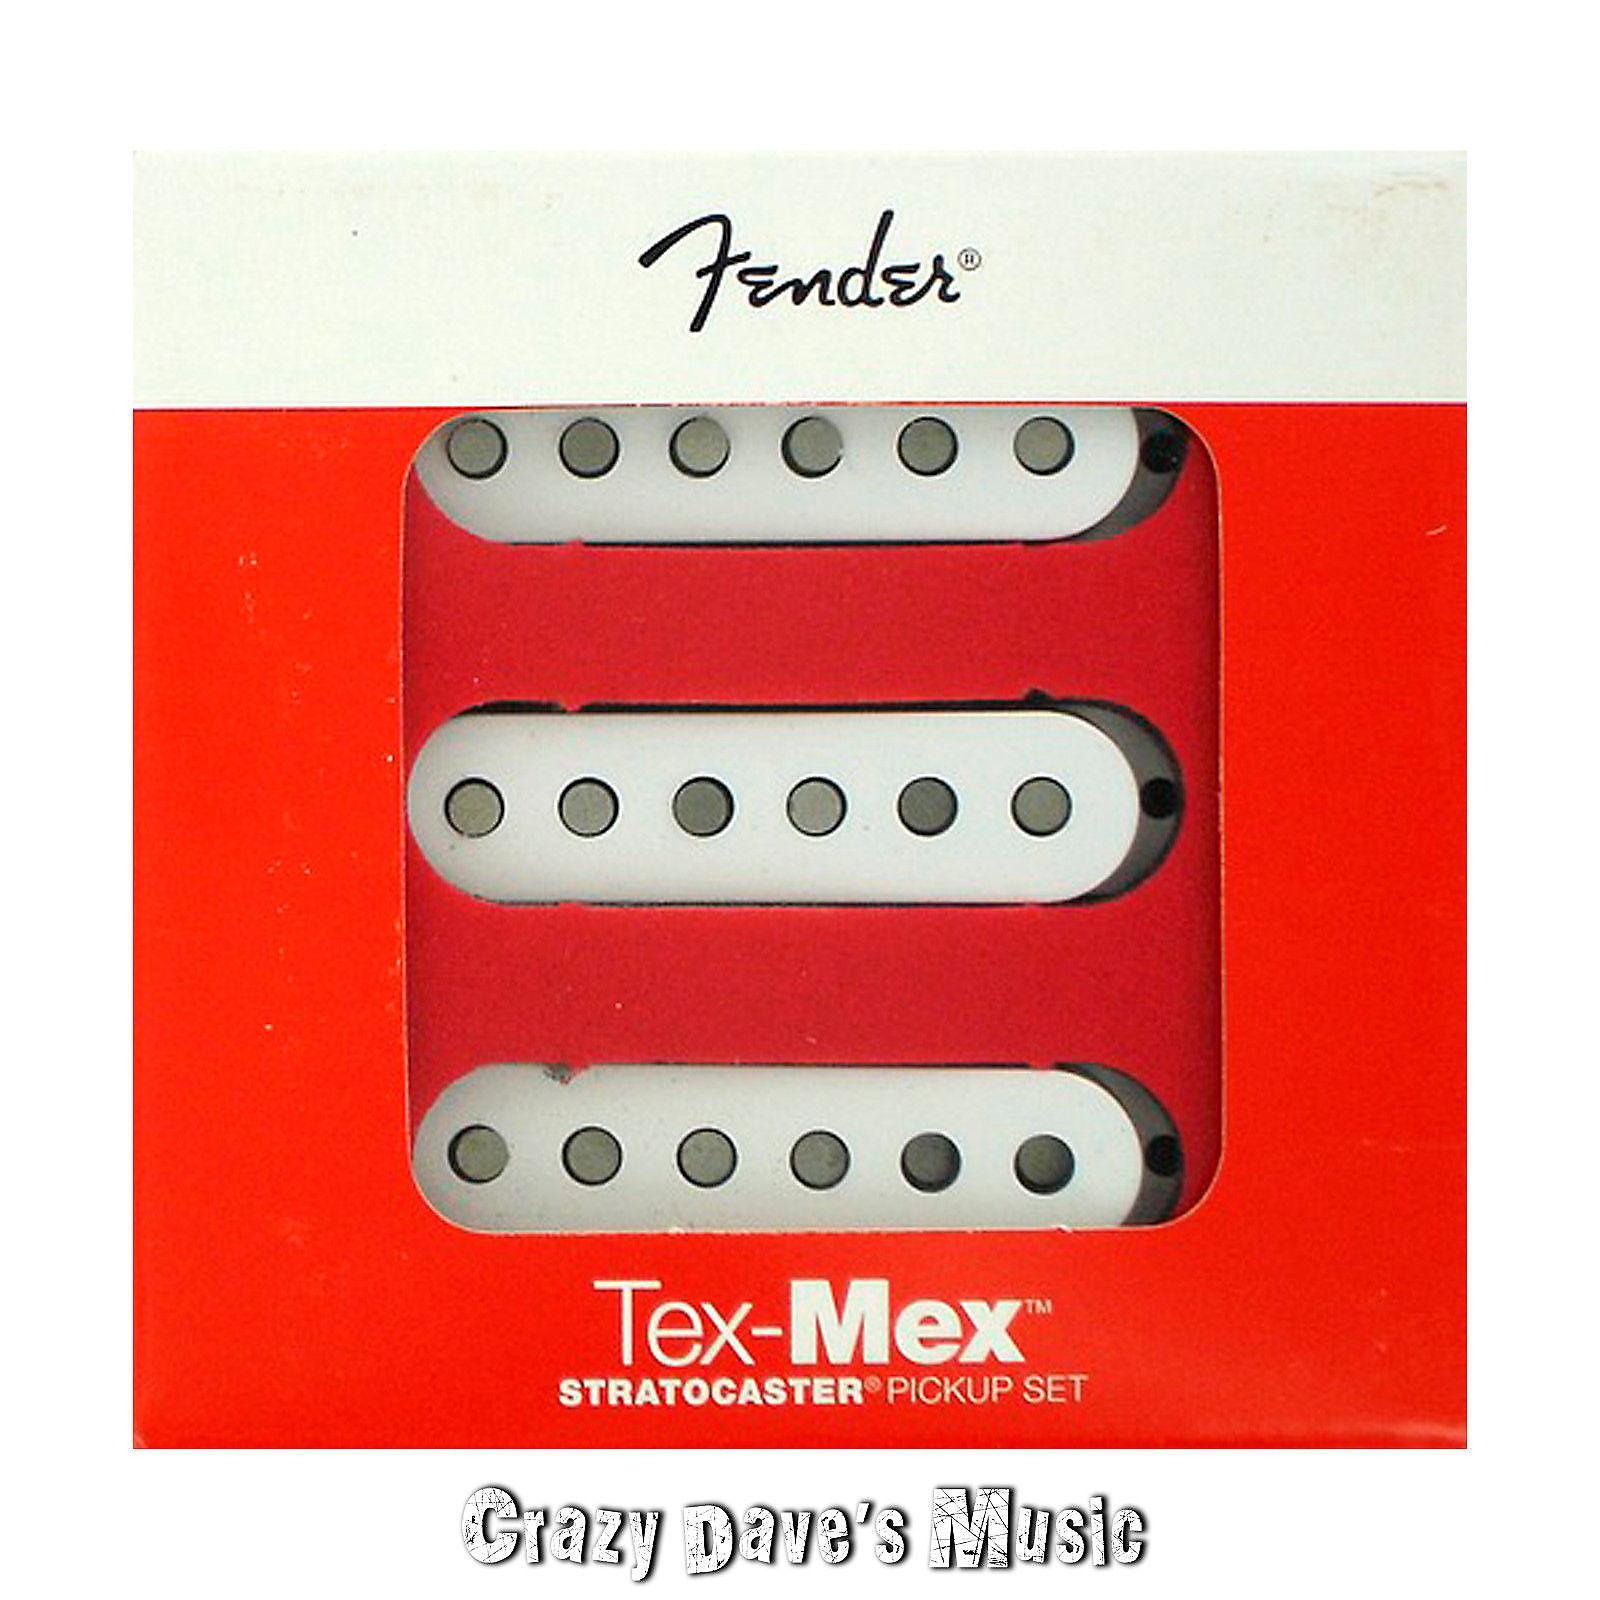 Astonishing Fender Original Tex Mex Strat Pickup Set 0992131000 Wiring Database Liteviha4X4Andersnl